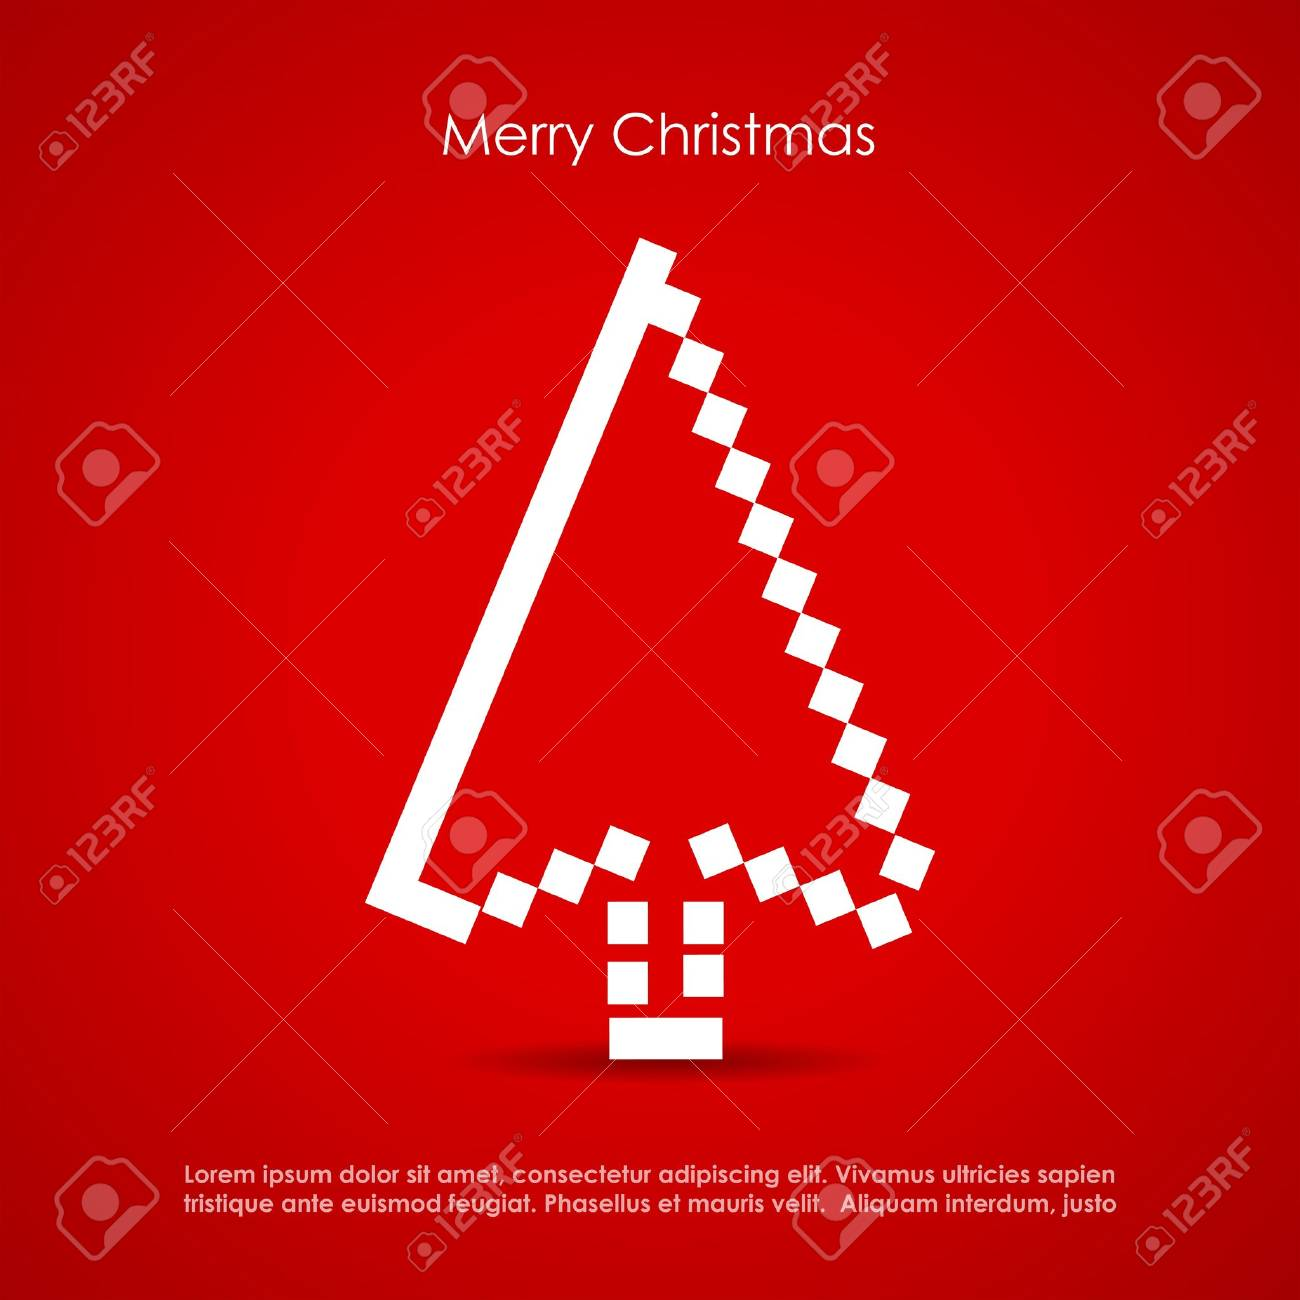 Merry Christmas postcard Stock Vector - 16483907